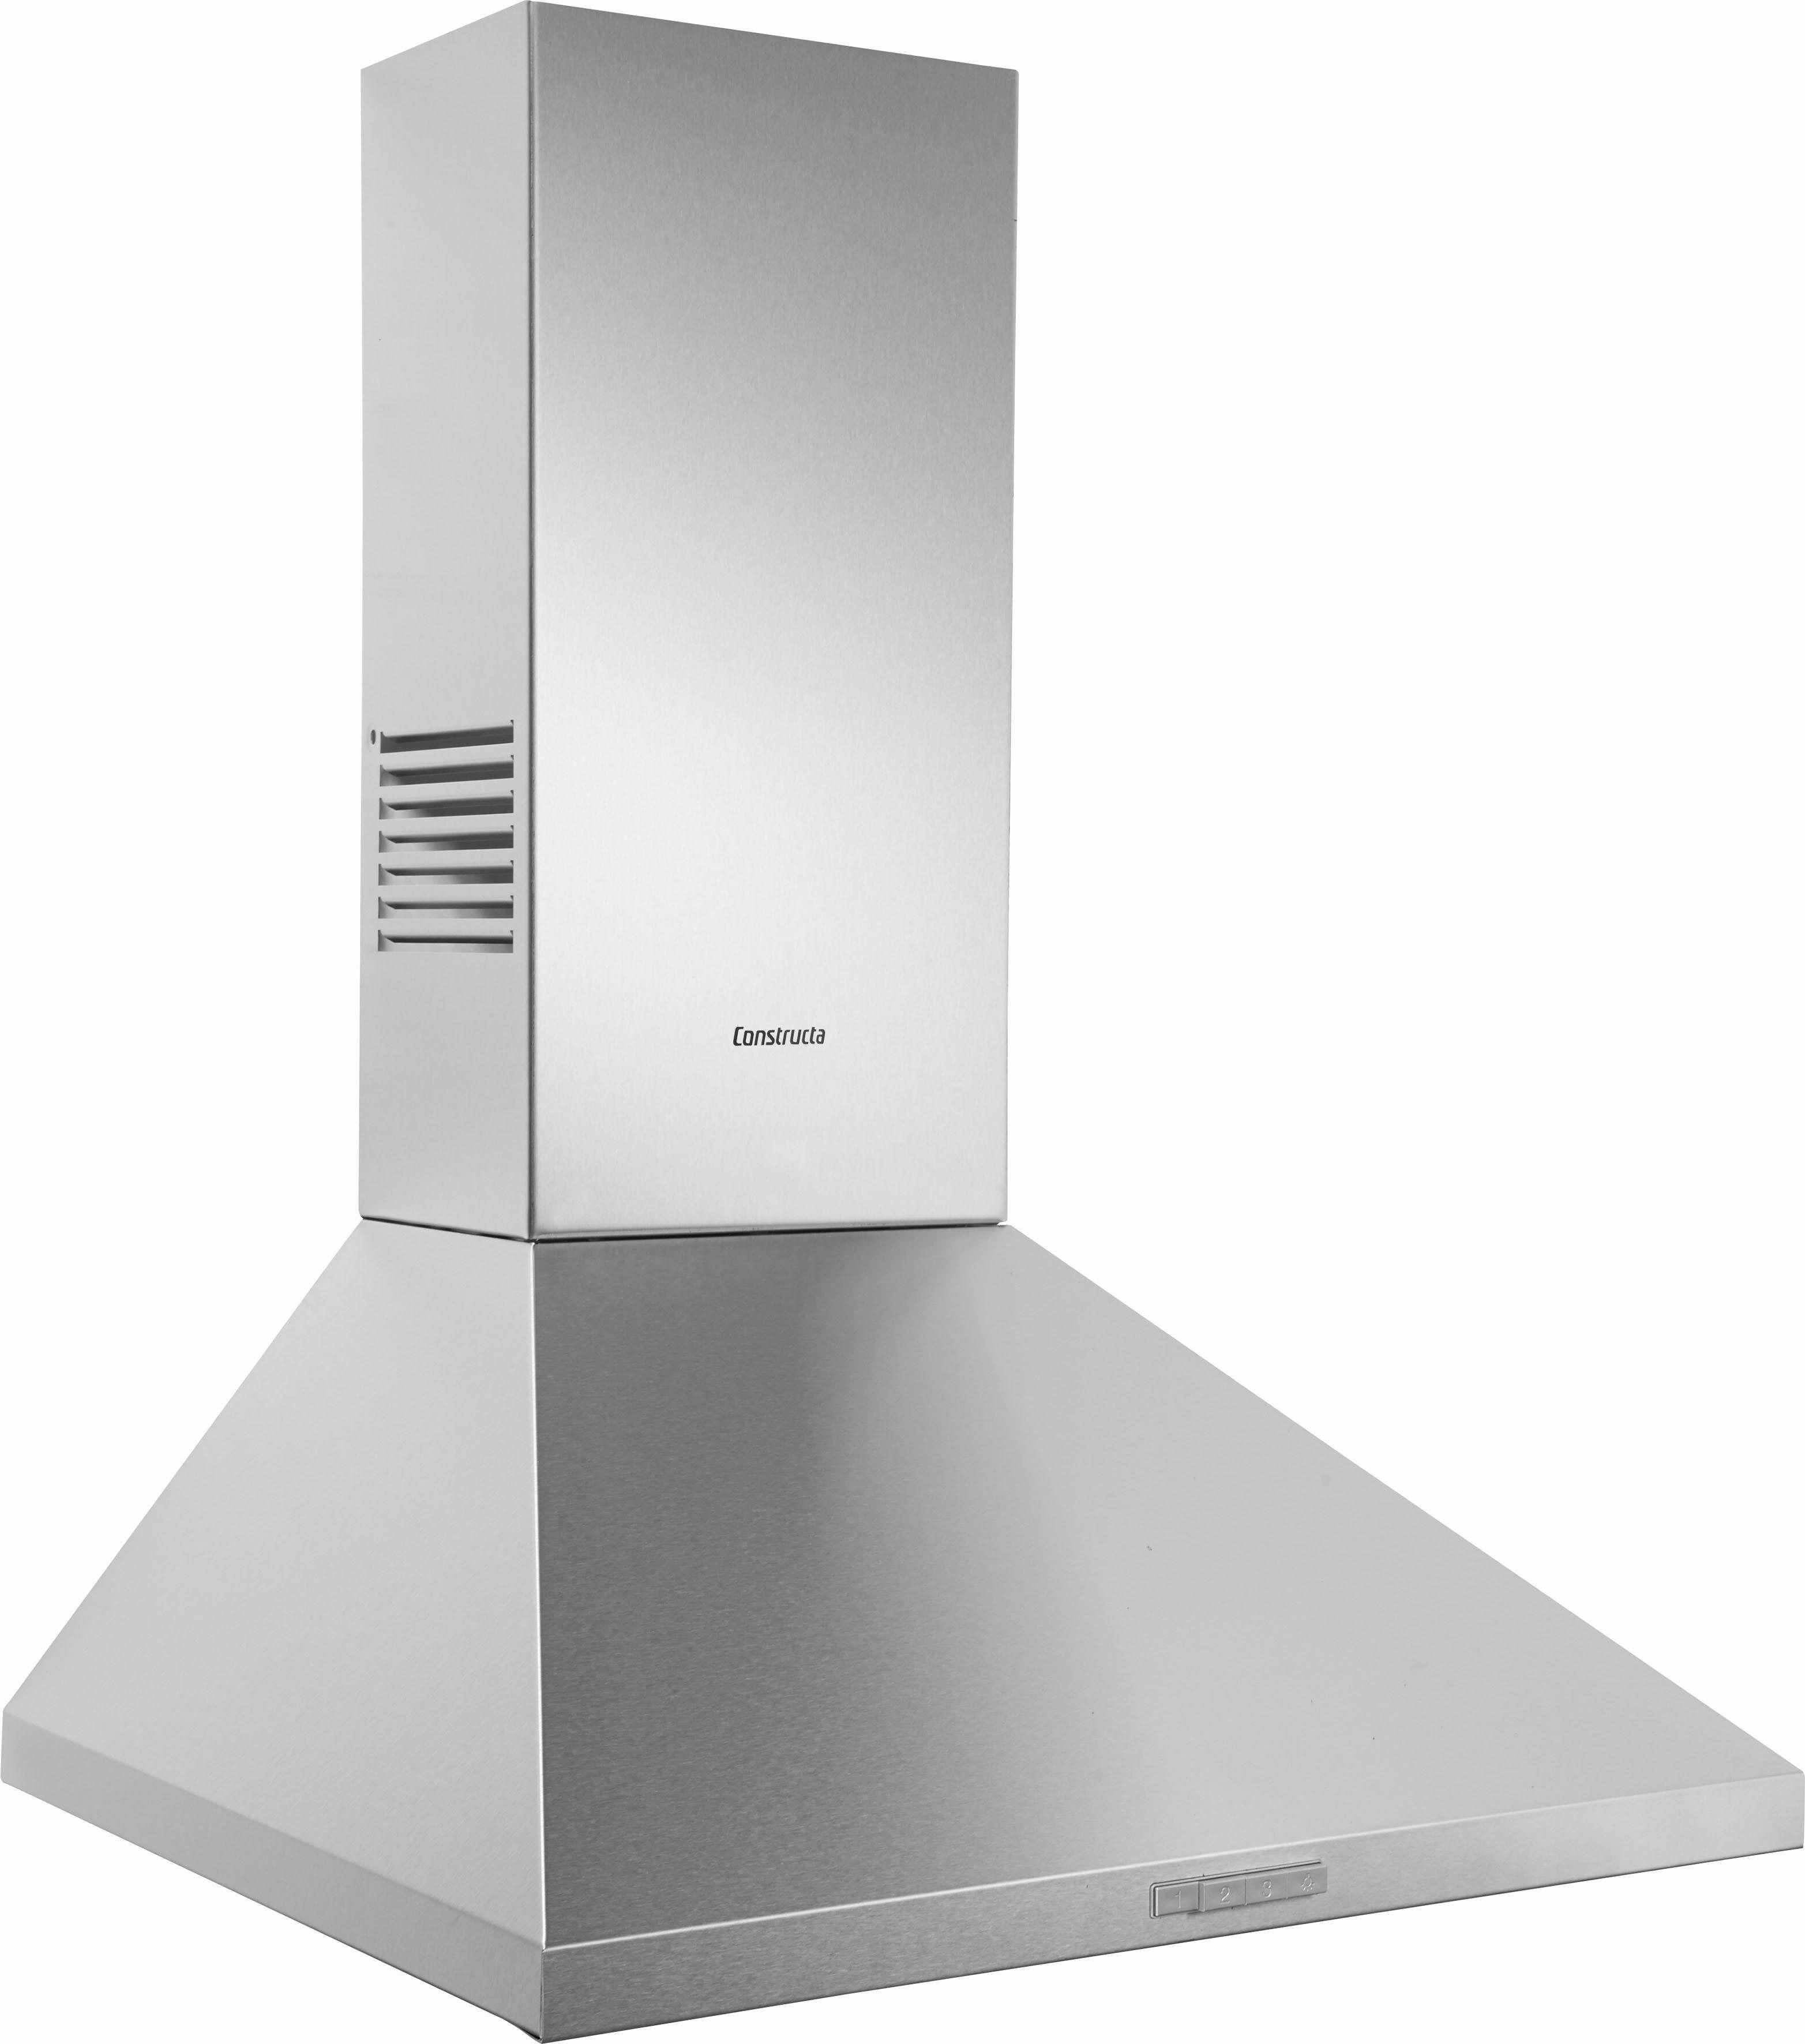 Constructa Wandhaube CD616650, Energieeffizienzklasse C